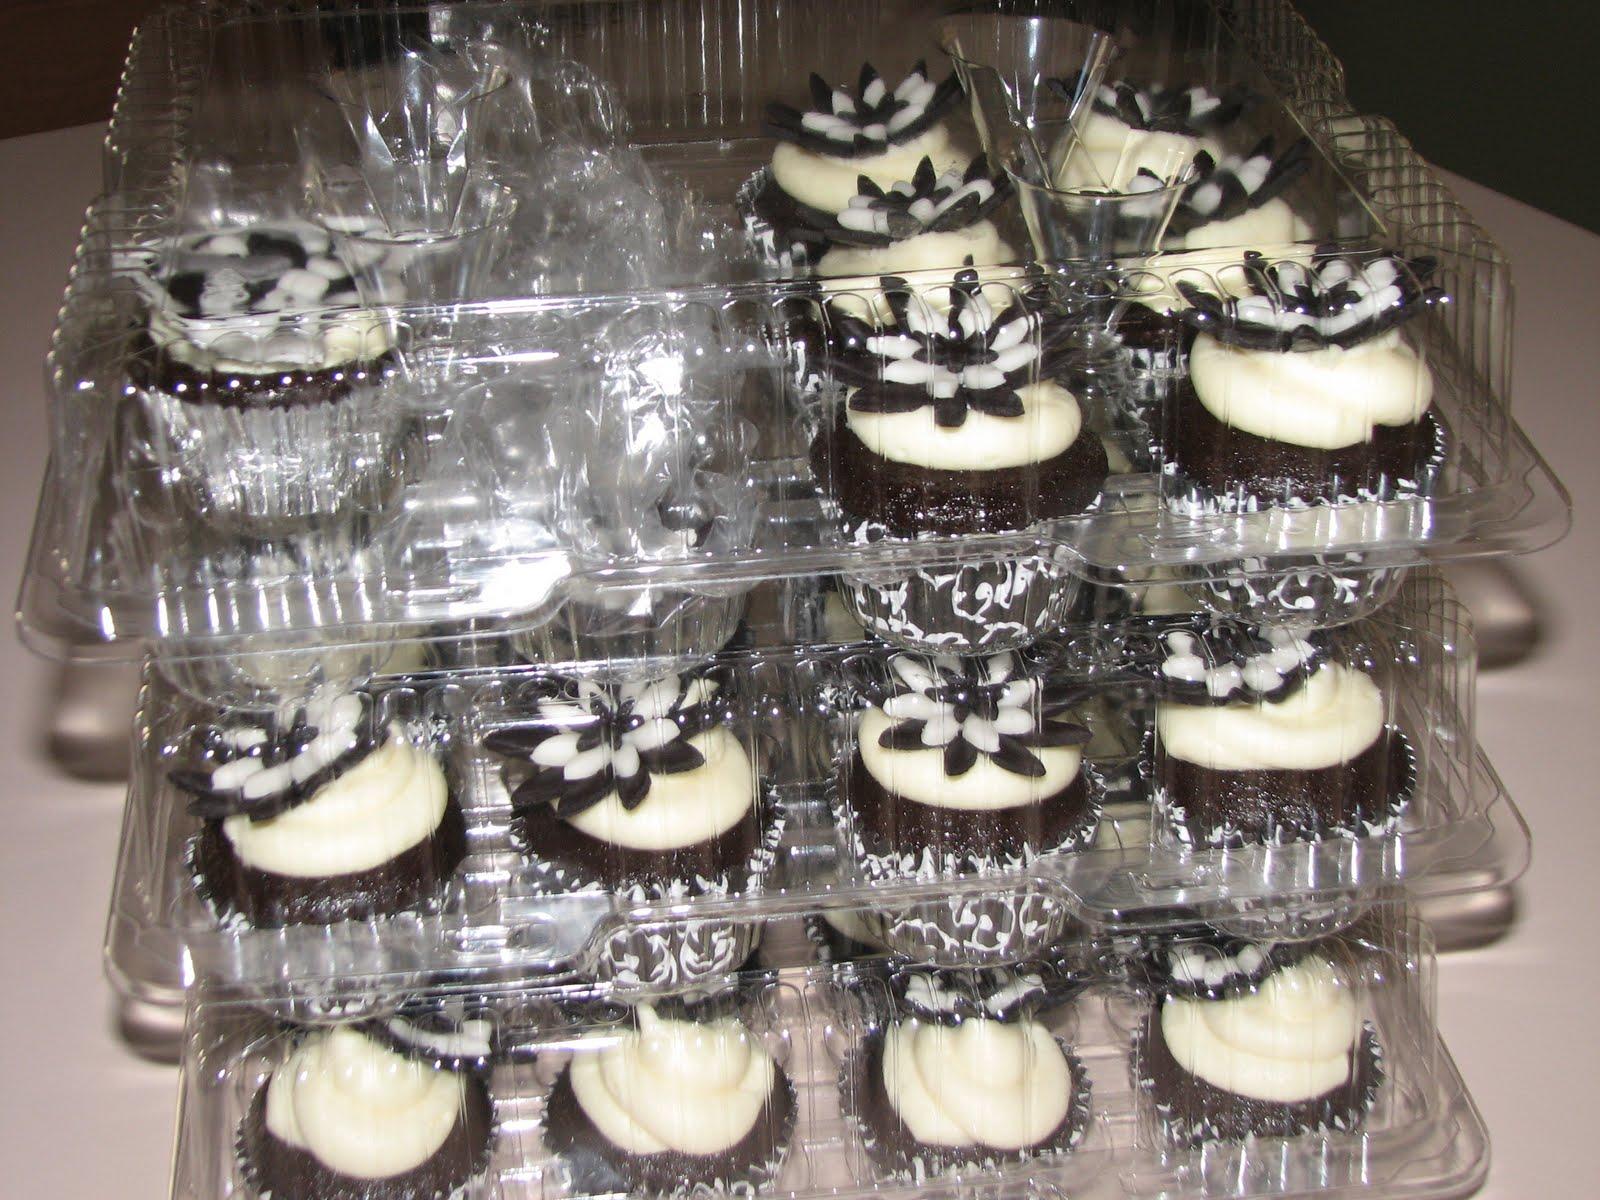 Raider Cupcakes